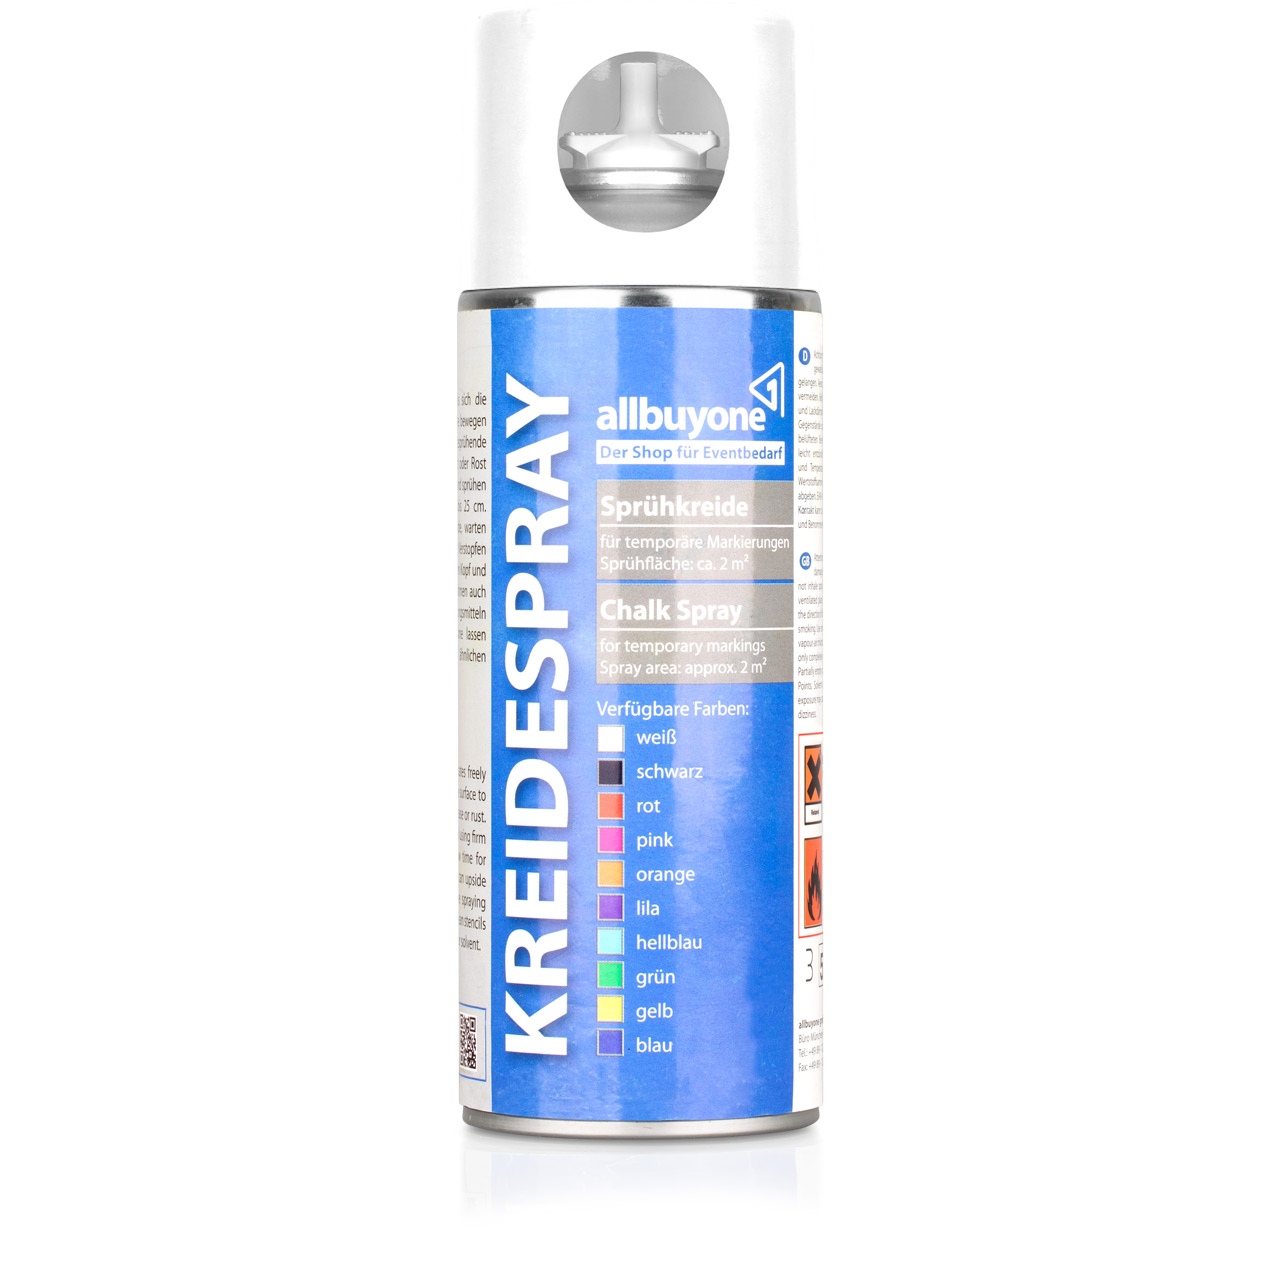 38c2e0a380954f Kreidespray kaufen - 400 ml Dose in 15 Farben